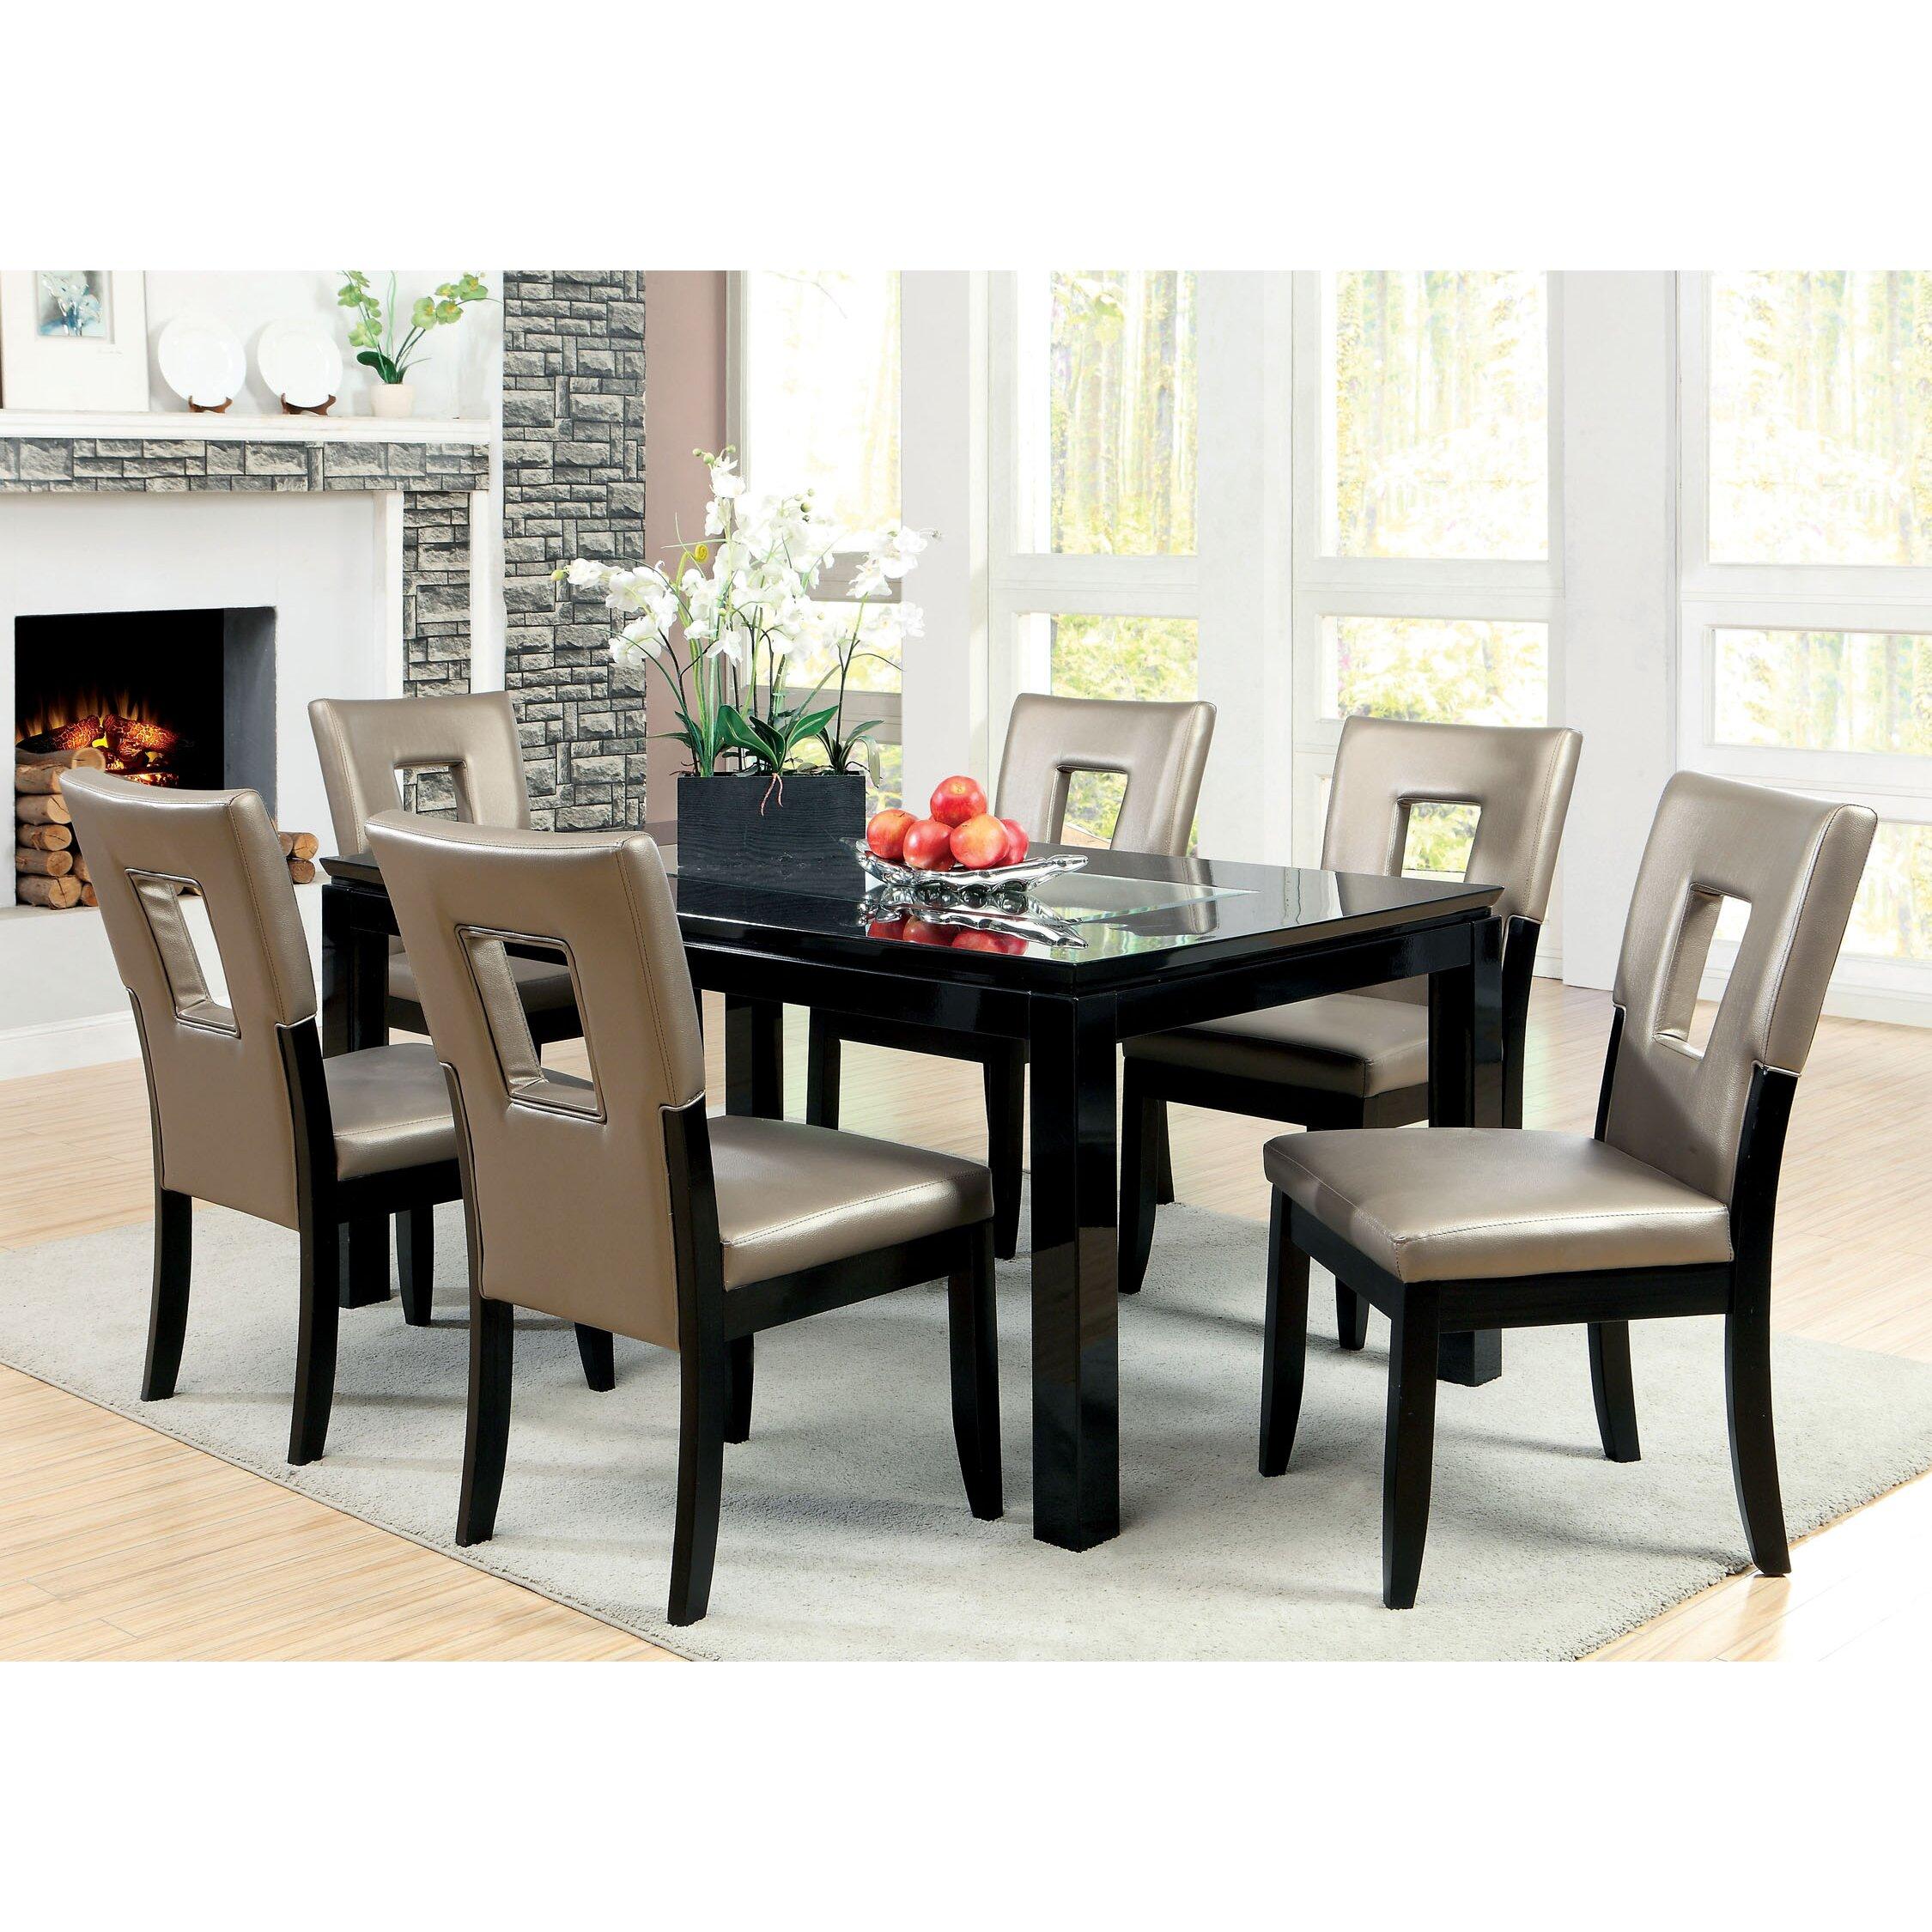 Hokku designs vanderbilte 7 piece dining set reviews for Hokku designs dining room furniture